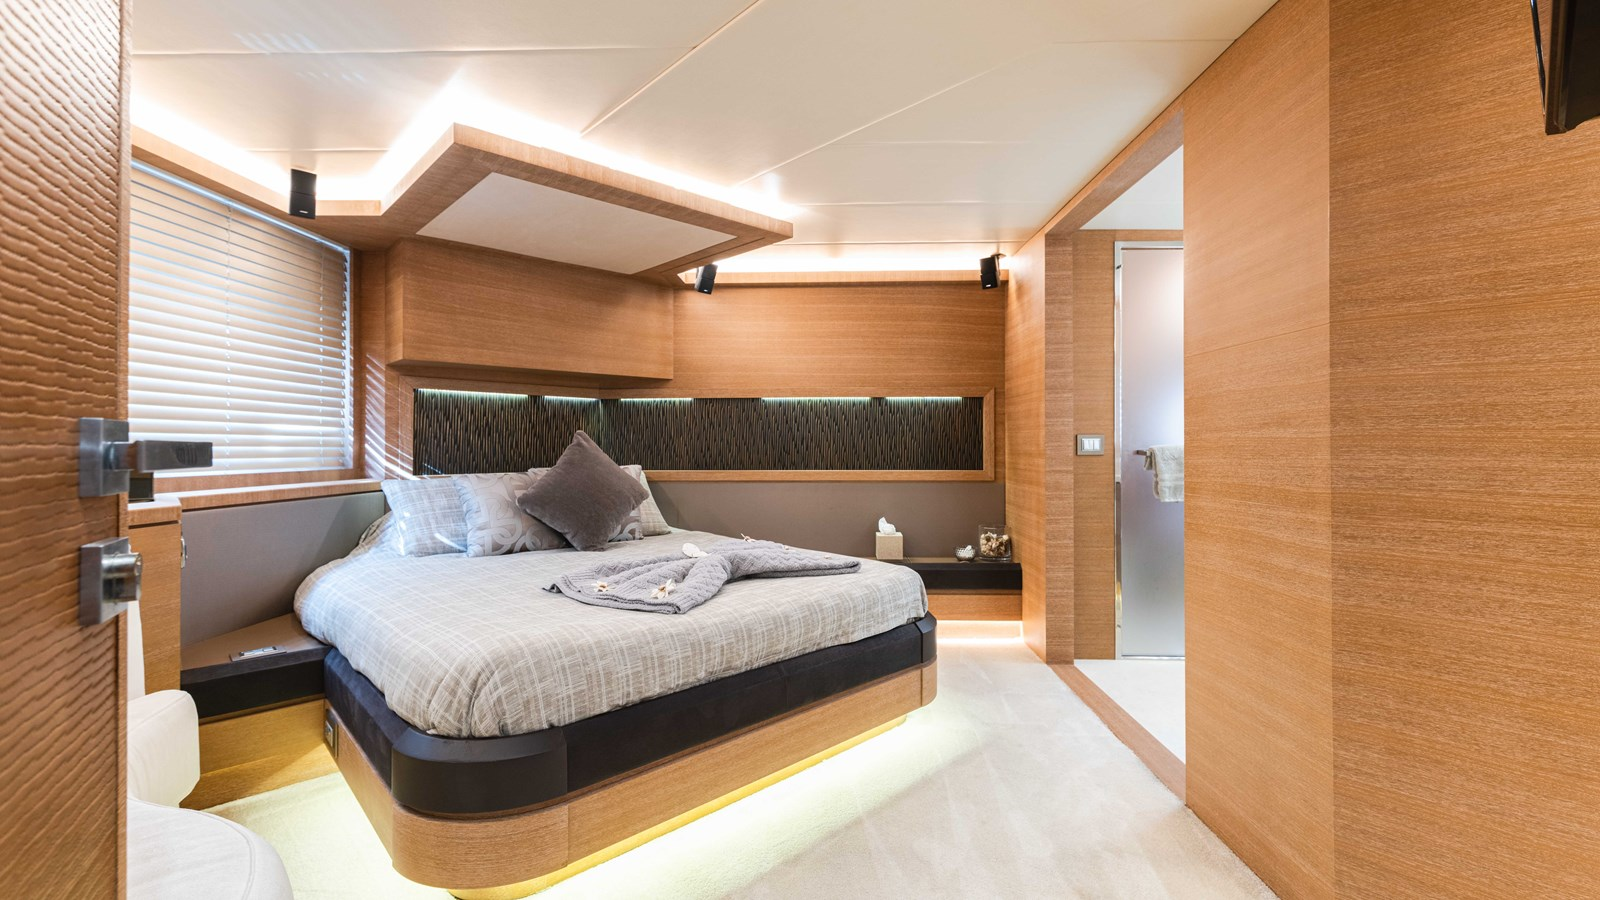 76 Monte Carlo (21 of 127) 2014 MONTE CARLO YACHTS Motoryacht Motor Yacht 2825166